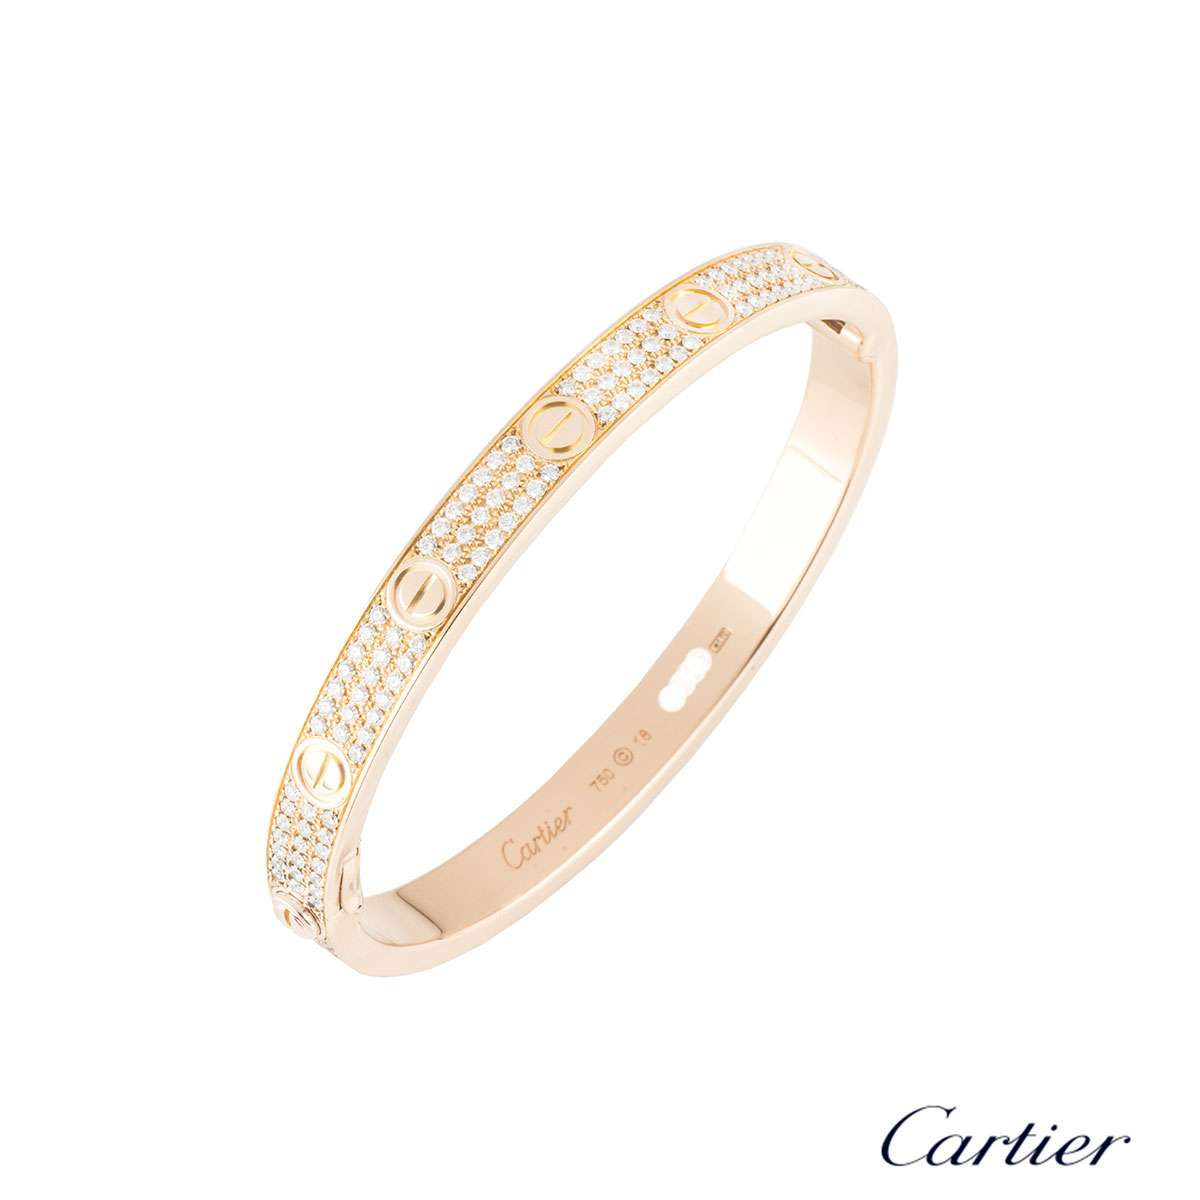 5f58f6c86a8588 Cartier Rose Gold Full Pave Love Bracelet Size 18 N6036918